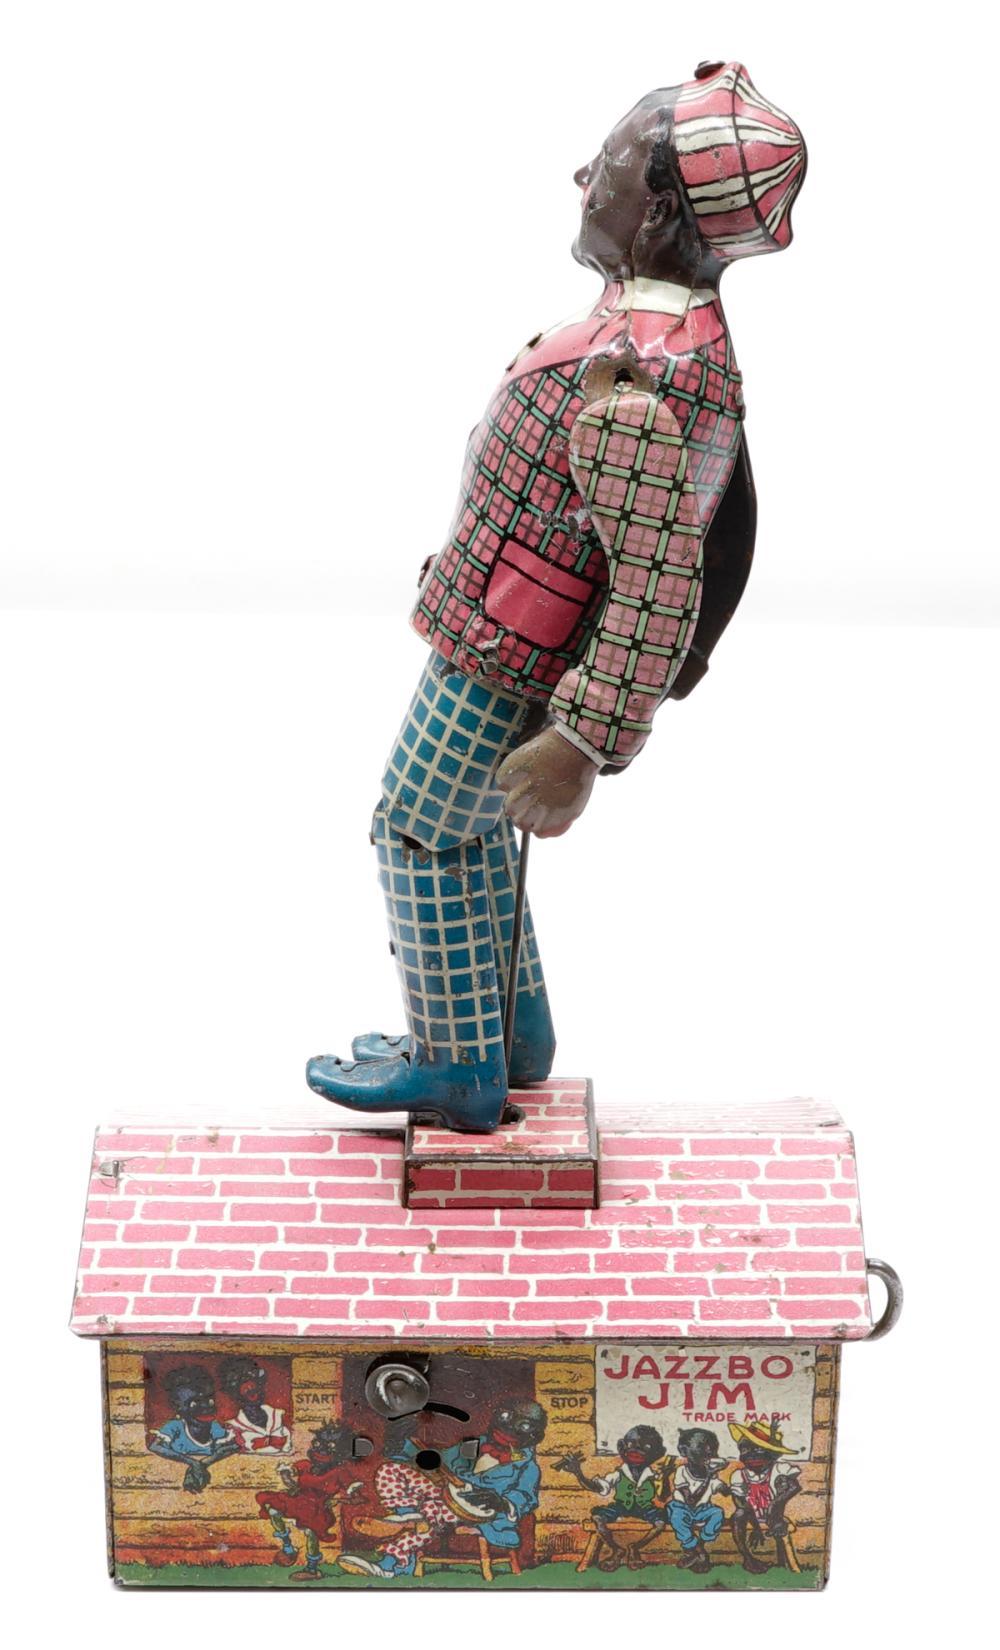 Lot 3: Jazzbo Jim Wind-Up Toy